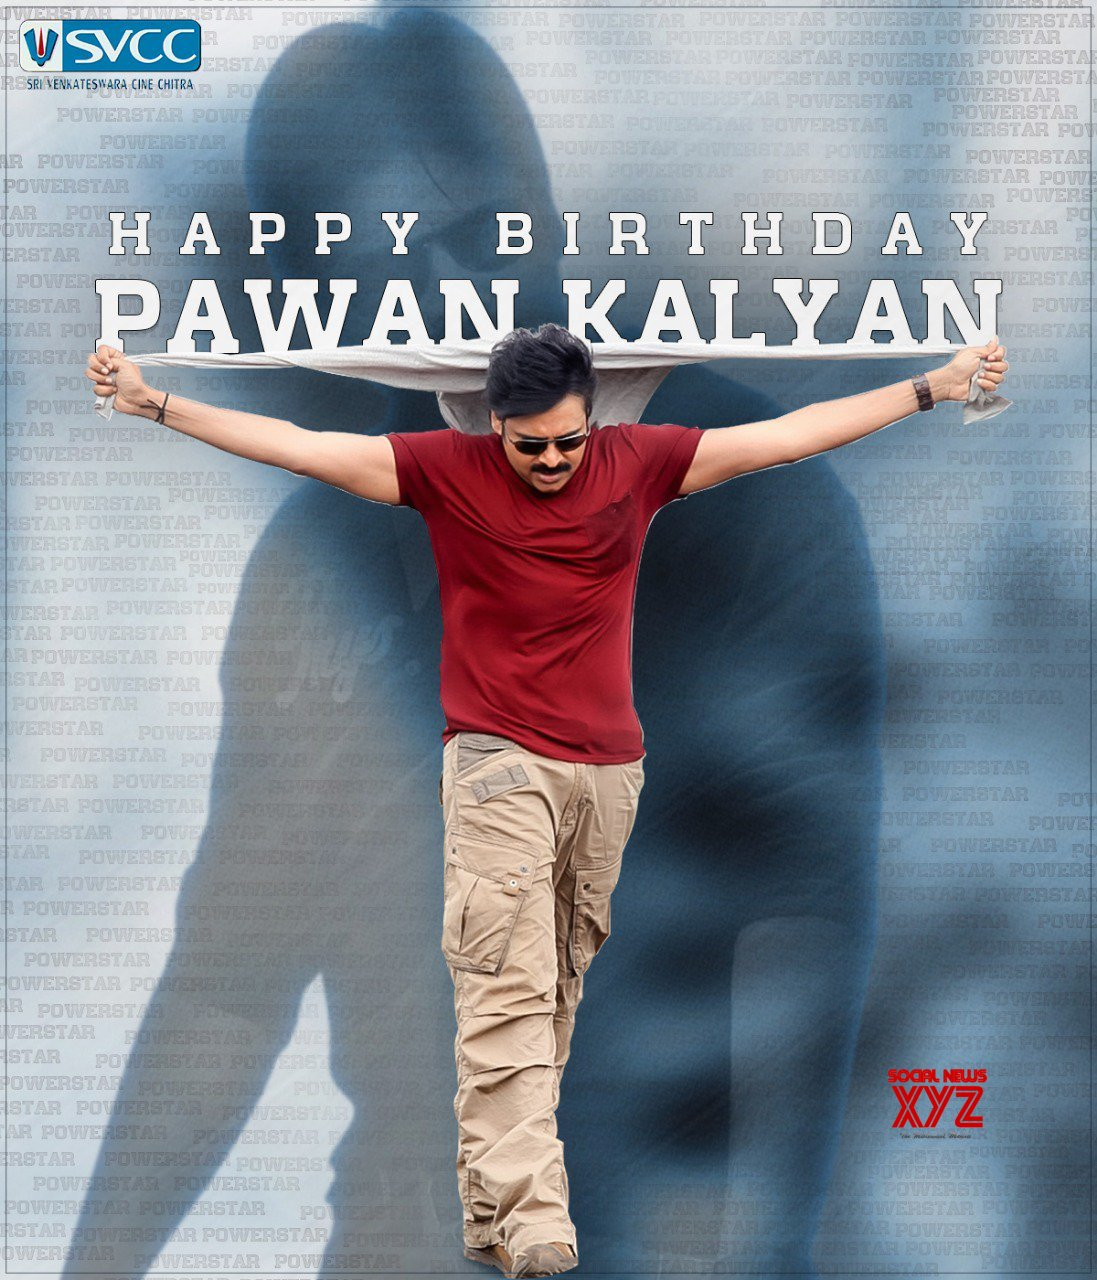 Janasenani Pawan Kalyan Birthday Wishes Posters From Sri Venkateswara Creations And Svcc Social News Xyz He began to call himself as pawan kalyan when he worked on his first film, akkada abbai ikkada ammayi, in 1996. janasenani pawan kalyan birthday wishes